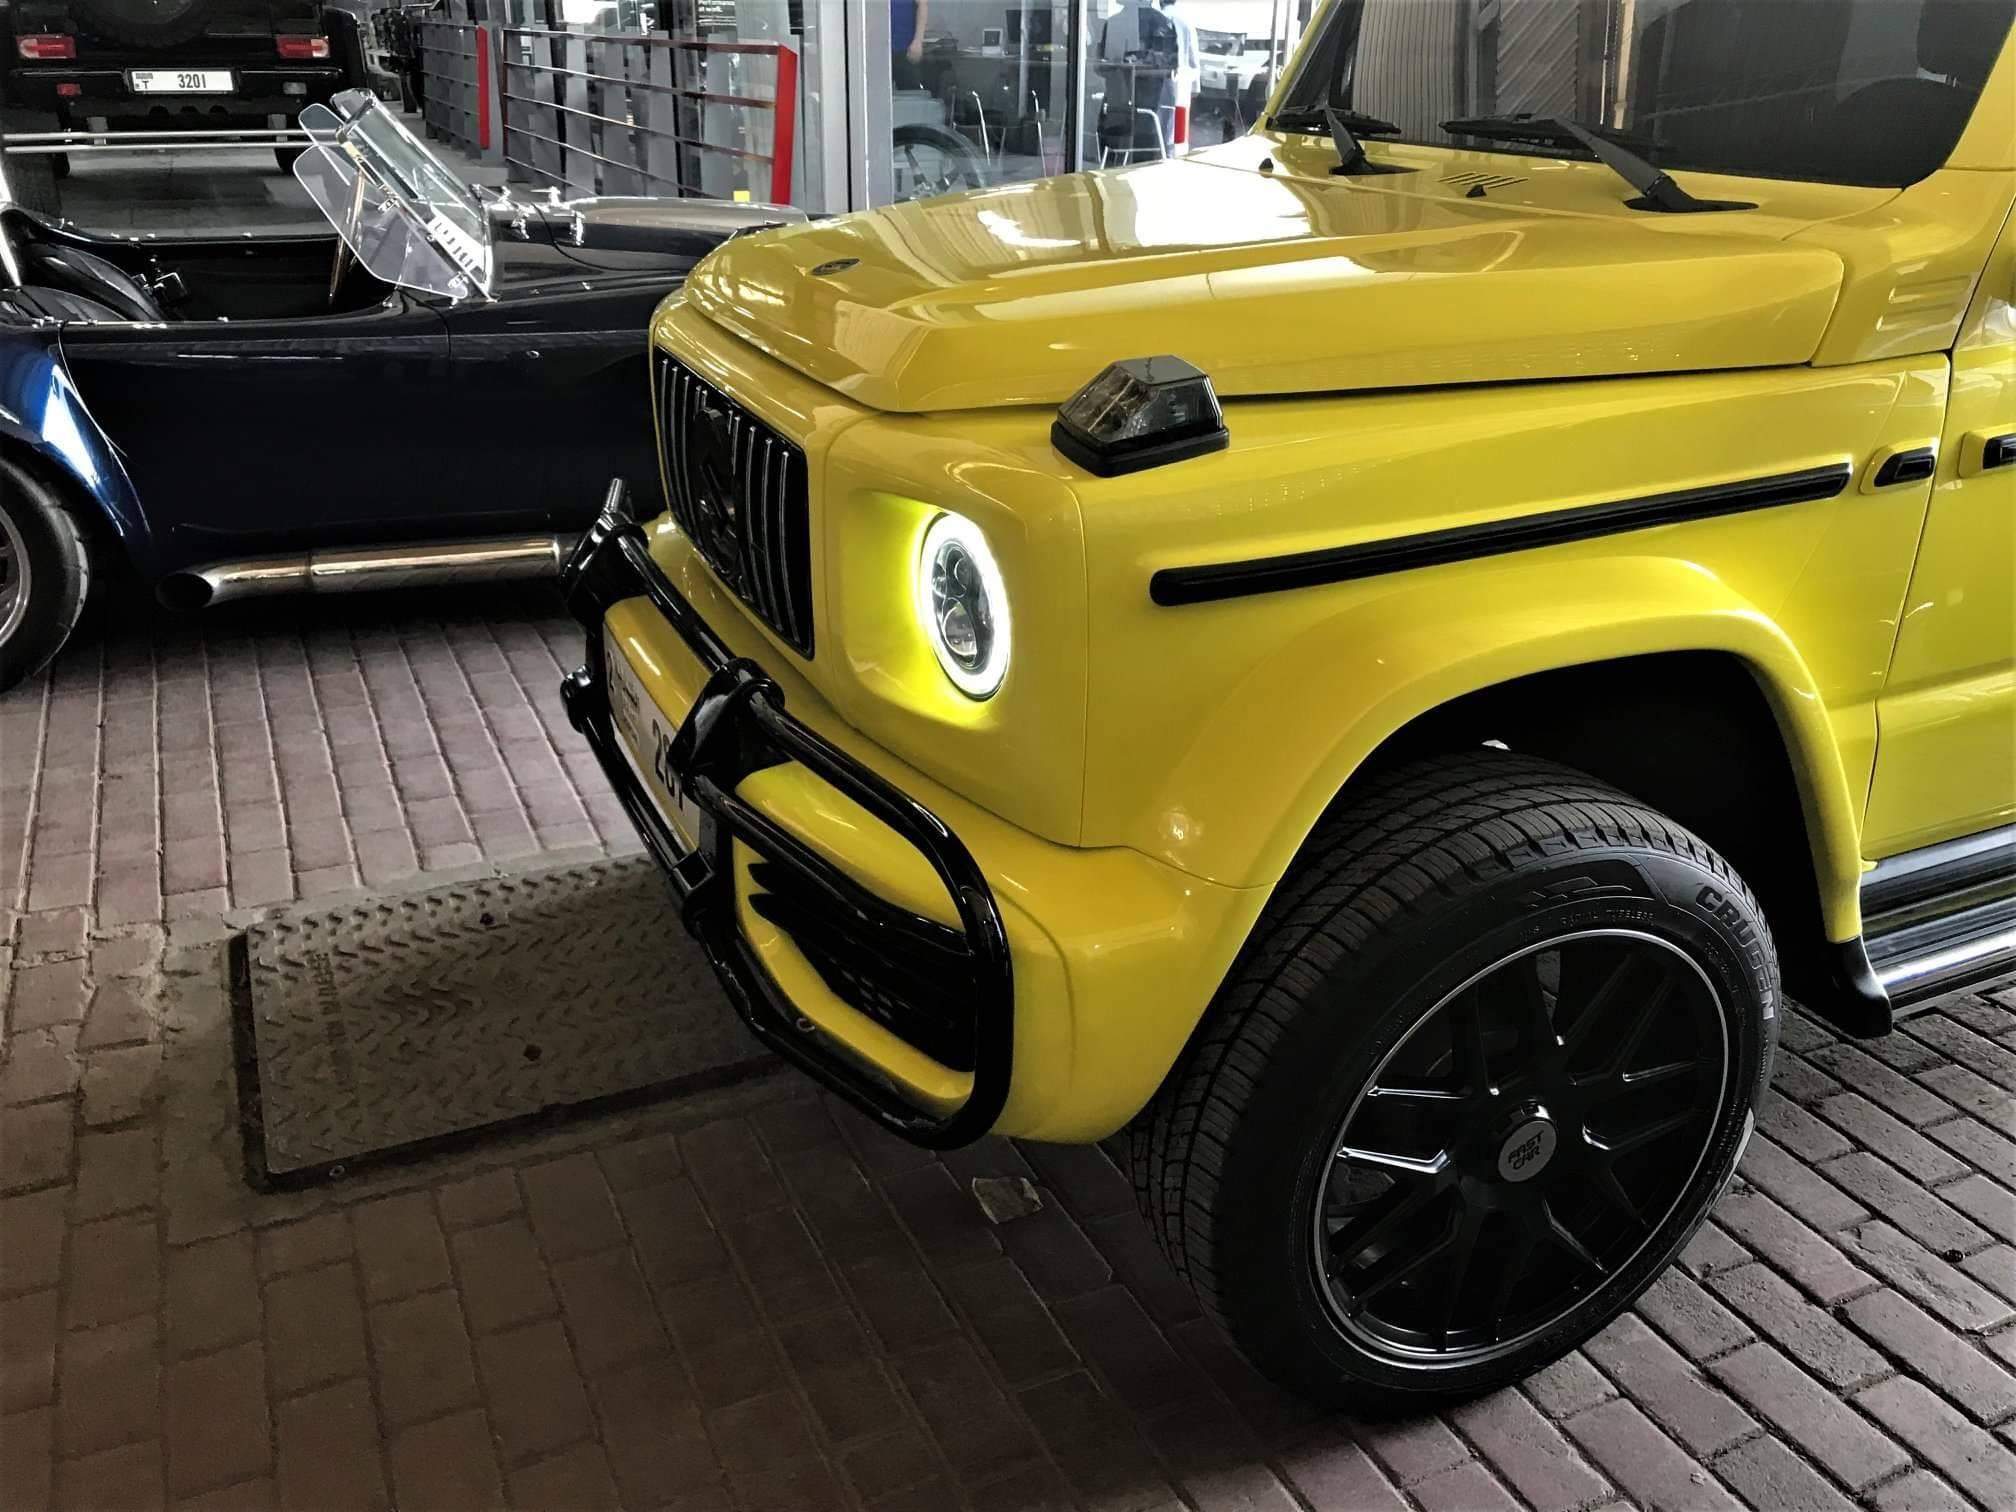 Suzuki-Jimny-bodykit-g-class-like-3